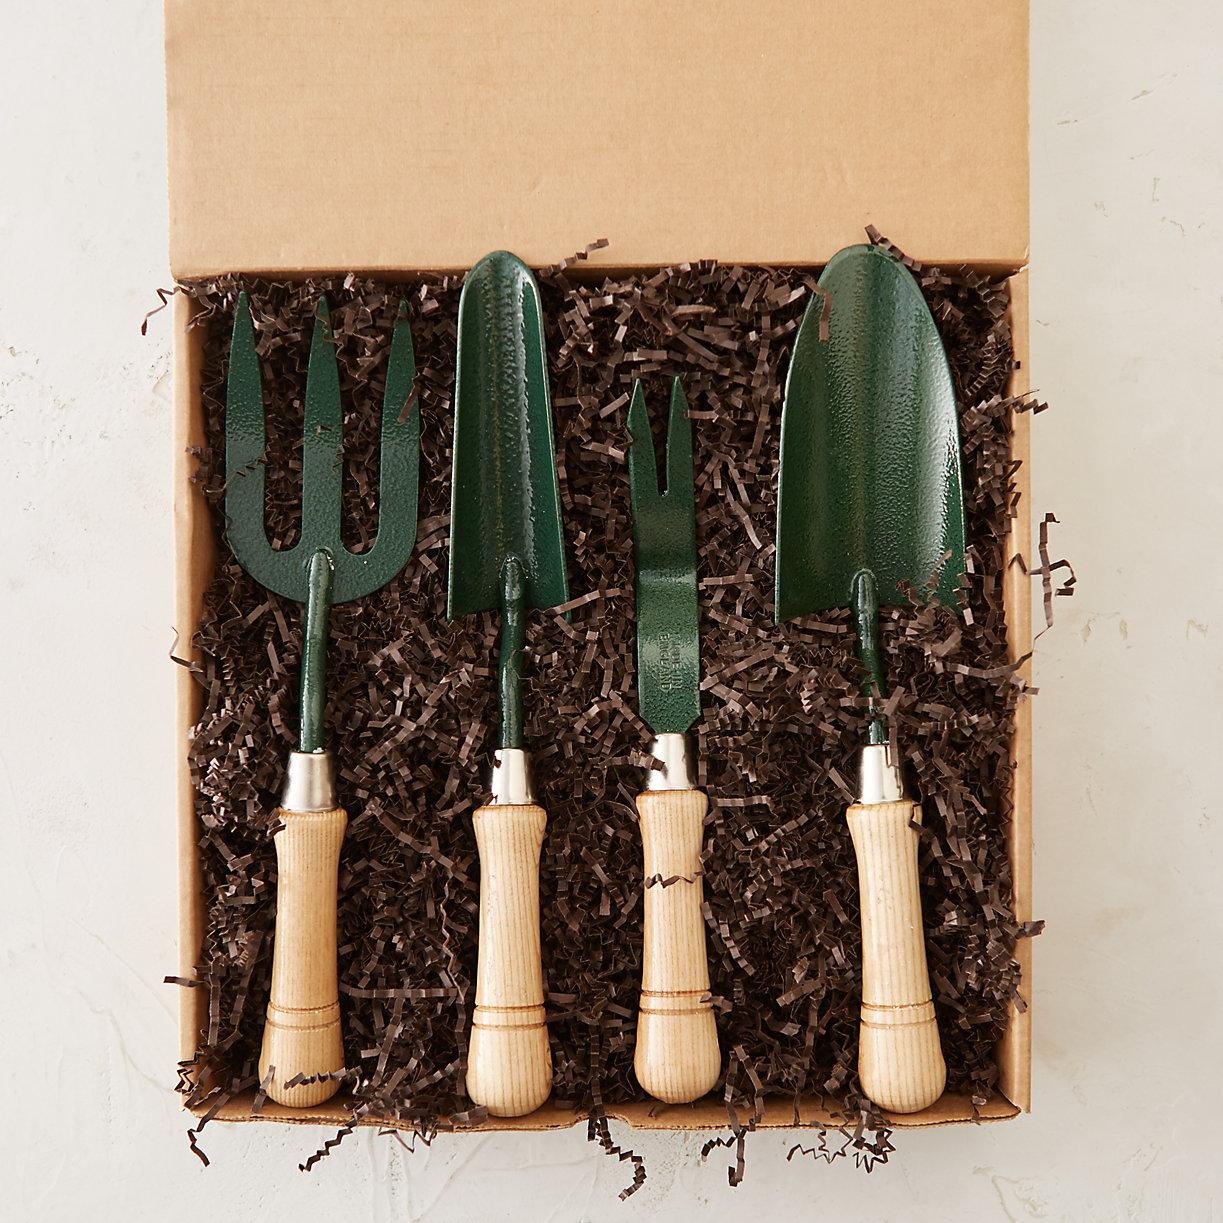 clarginton forge handtool gift set